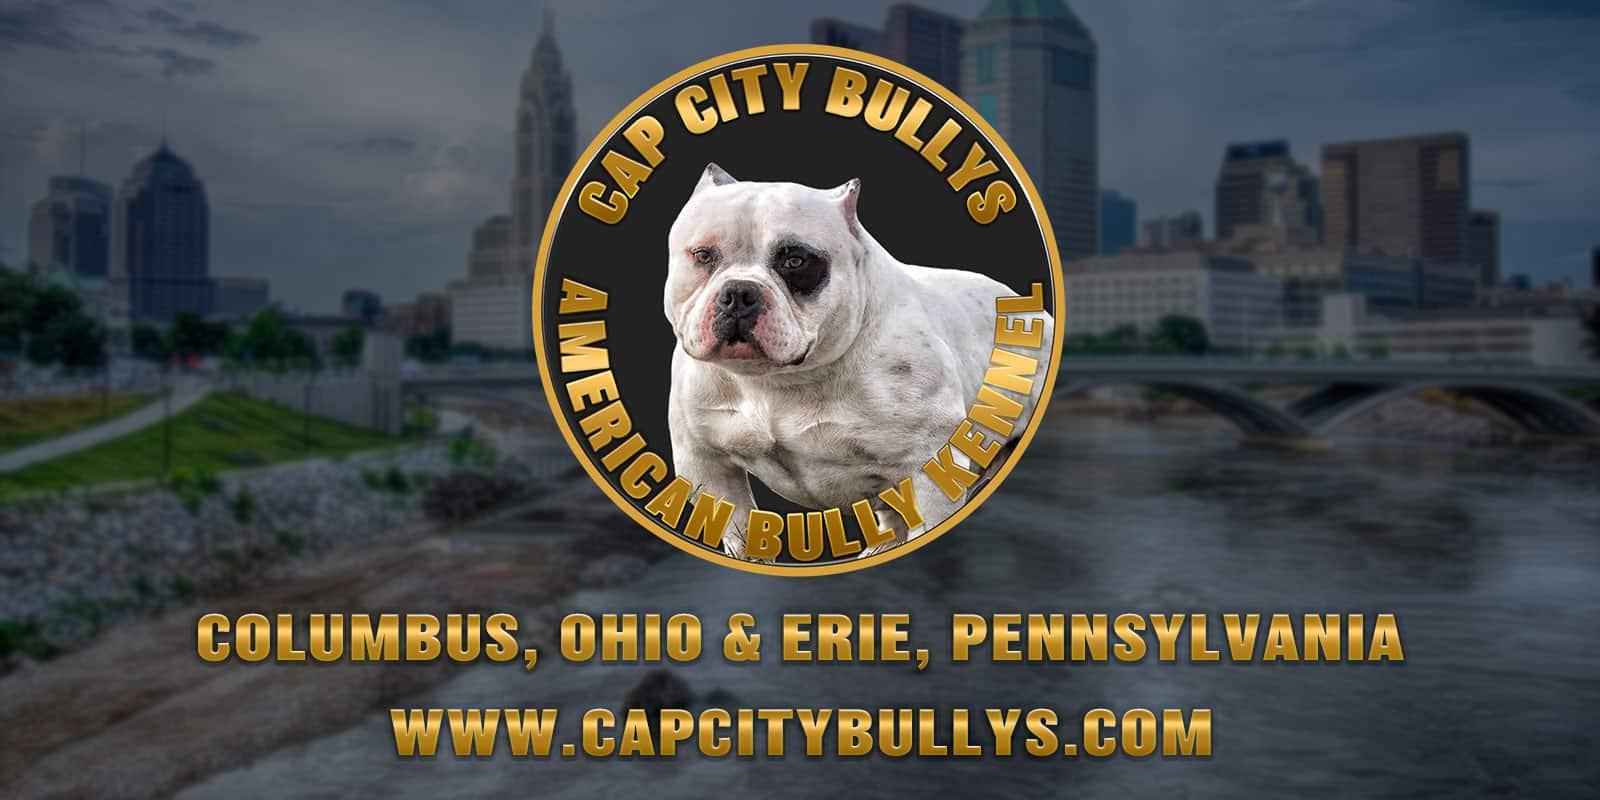 CapCity Bullys